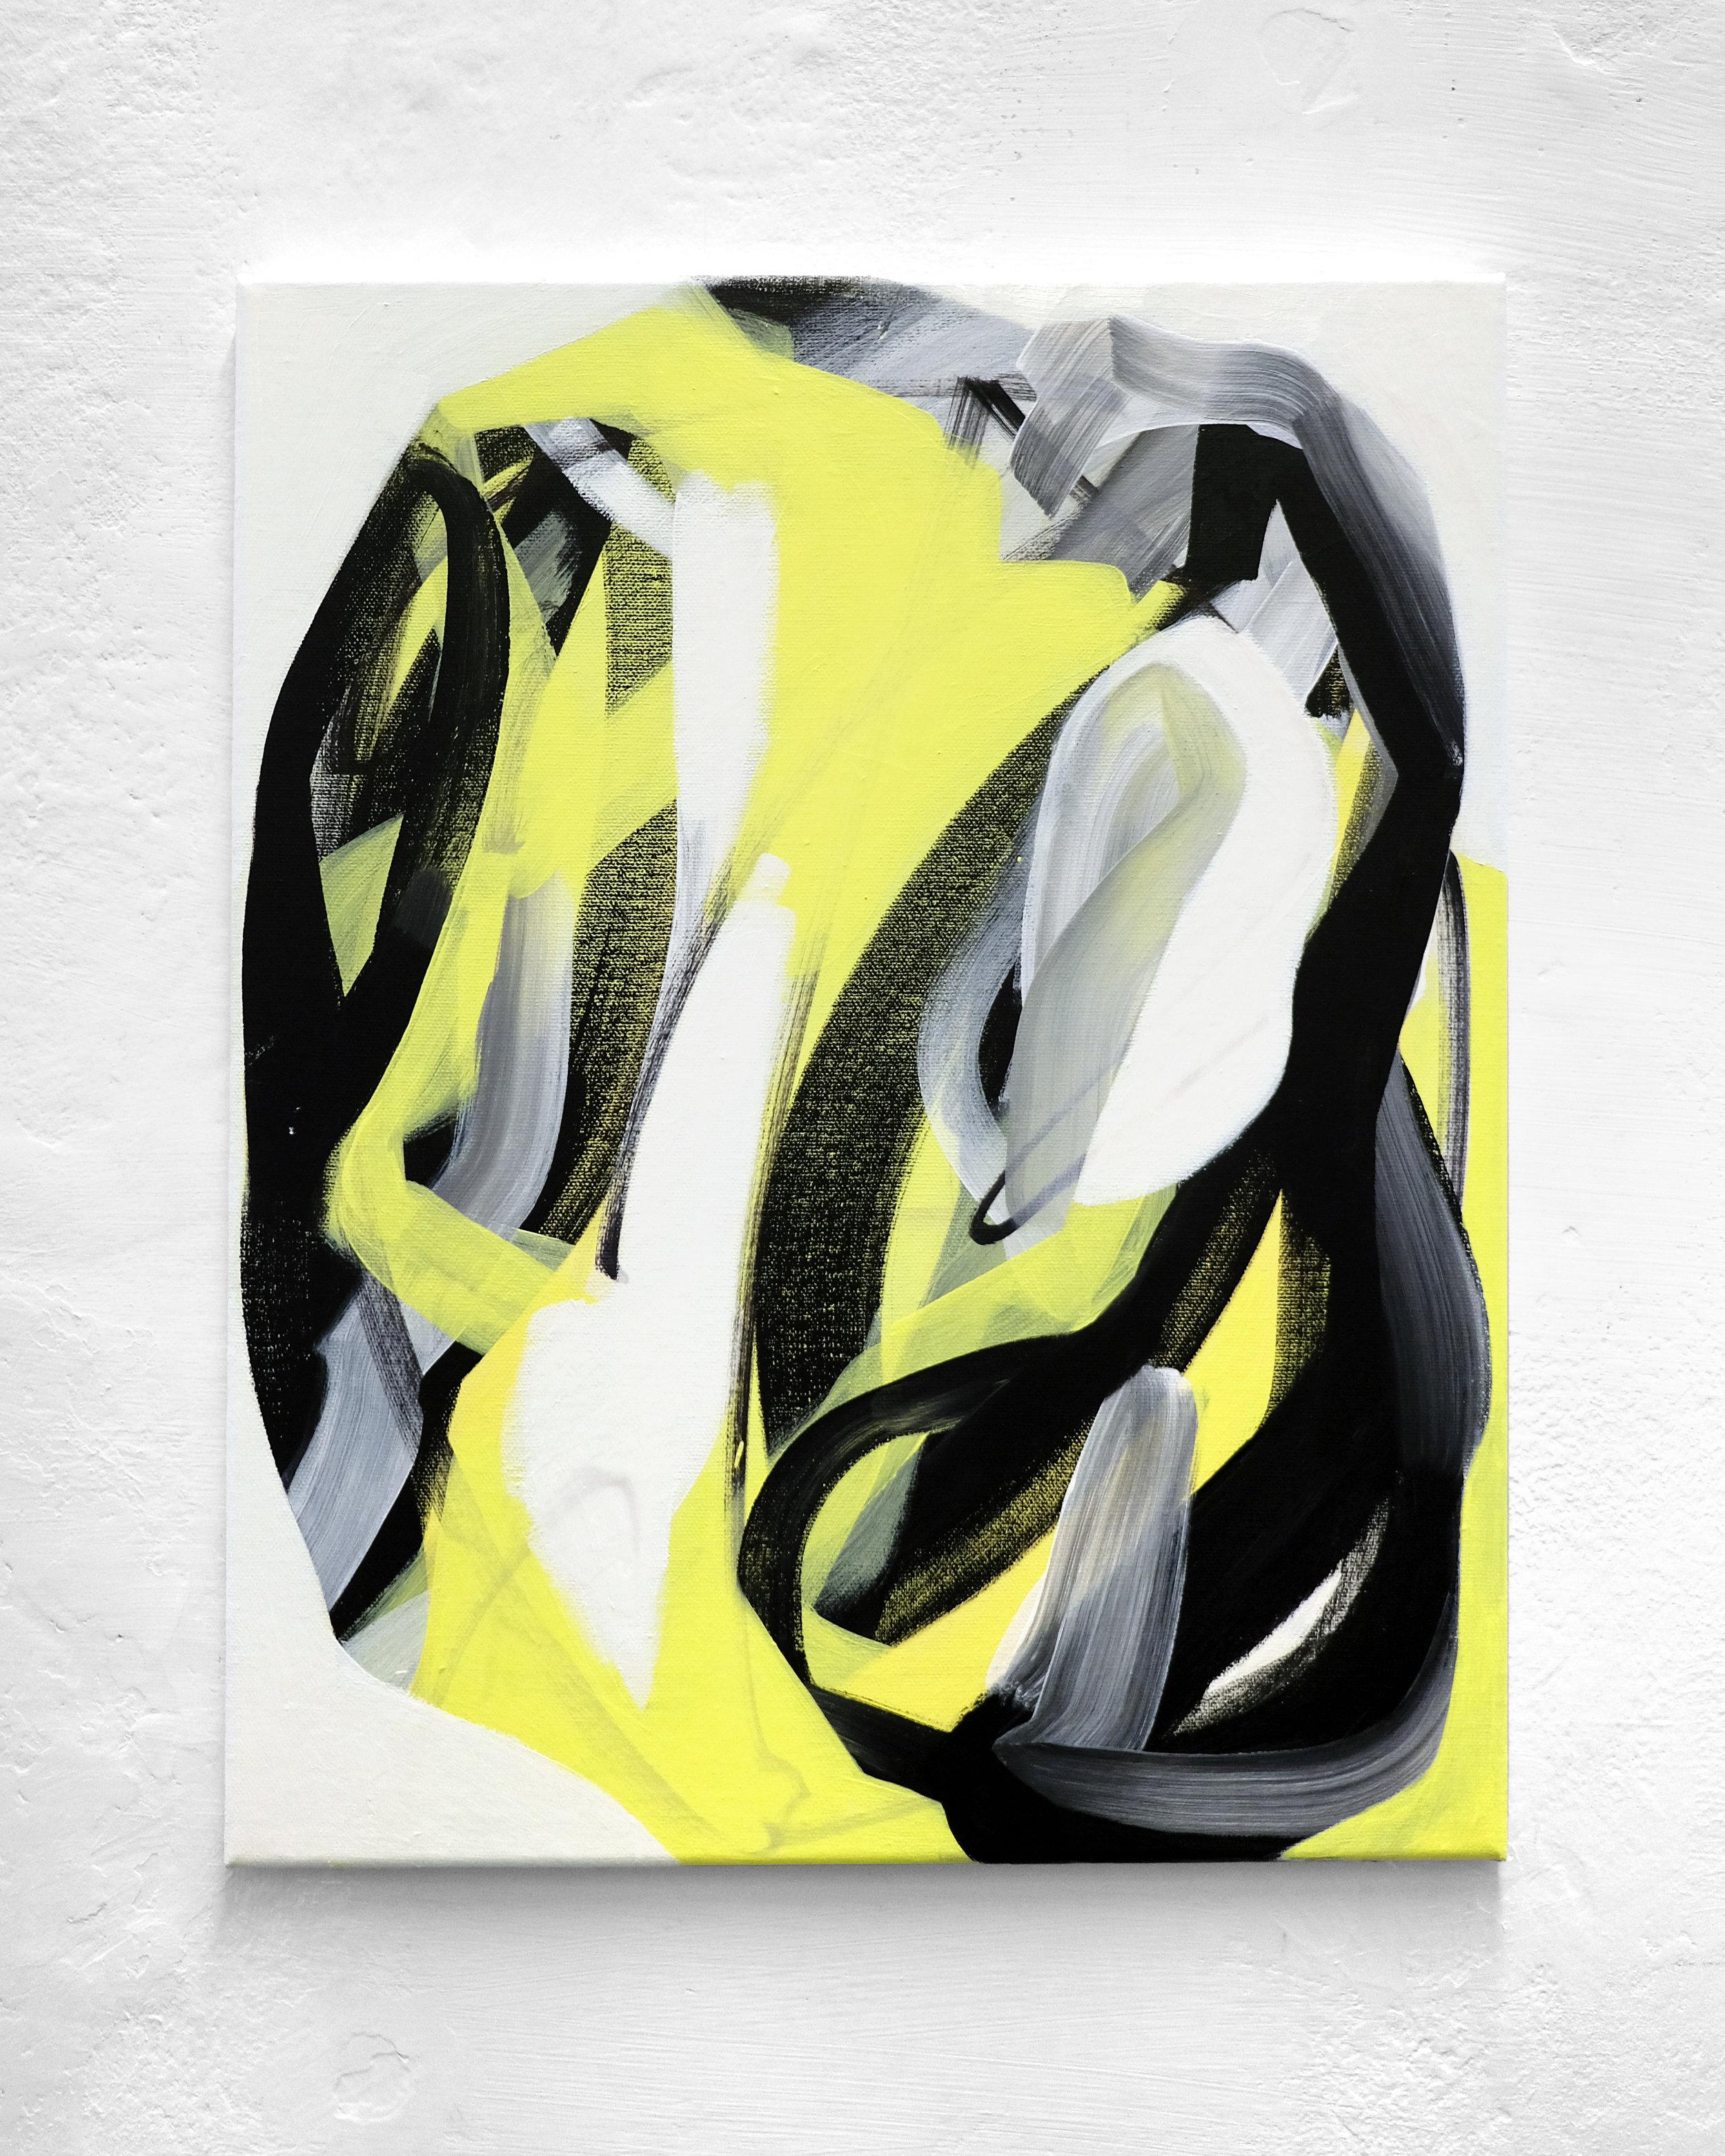 Pacific,acrylic on canvas, 50x40cm